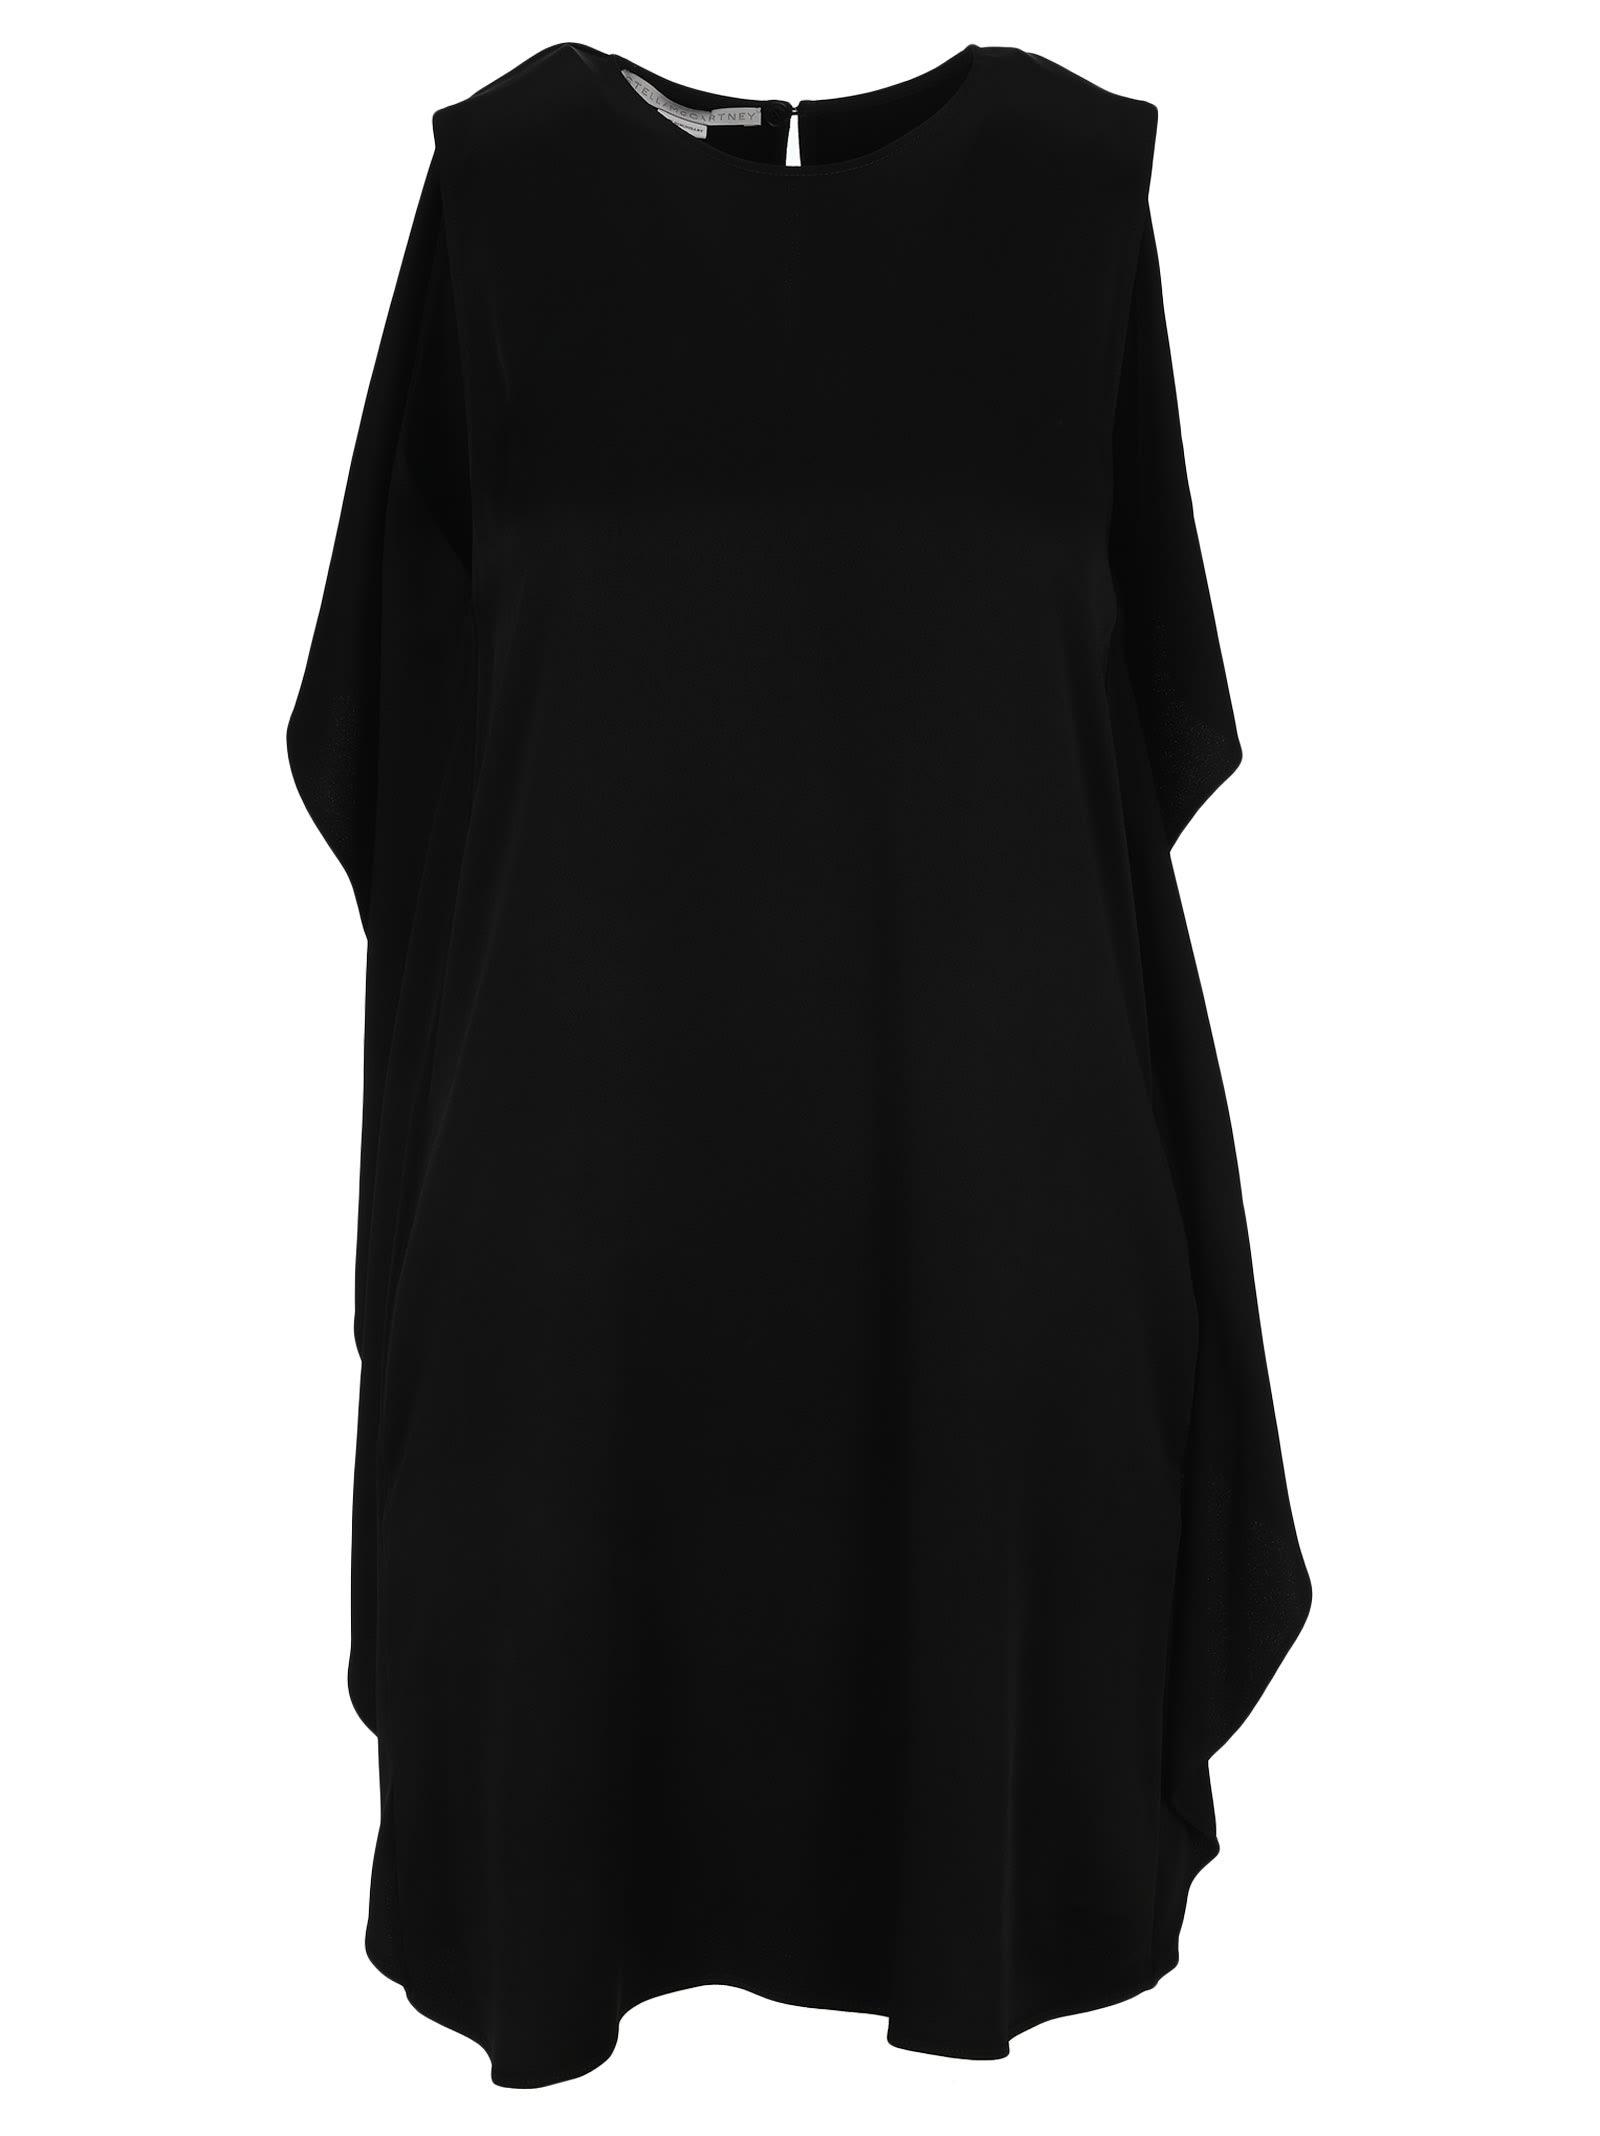 Buy Stella Mccartney Pleated Ruffles Short Dress online, shop Stella McCartney with free shipping